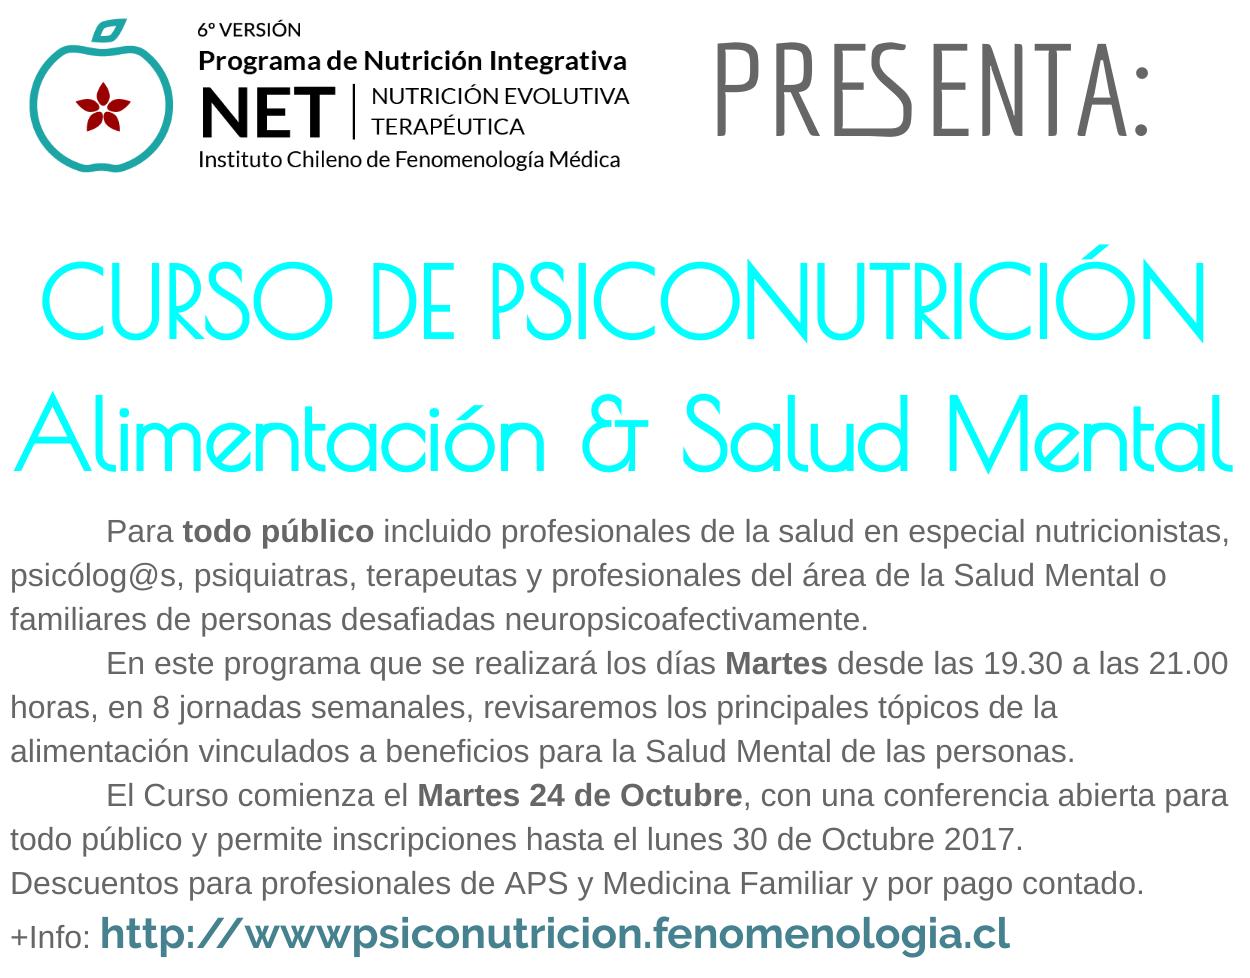 https://sites.google.com/a/ammonites.cl/fenomenologia-medica/programas/psiconutricion.fenomenologia.cl.png